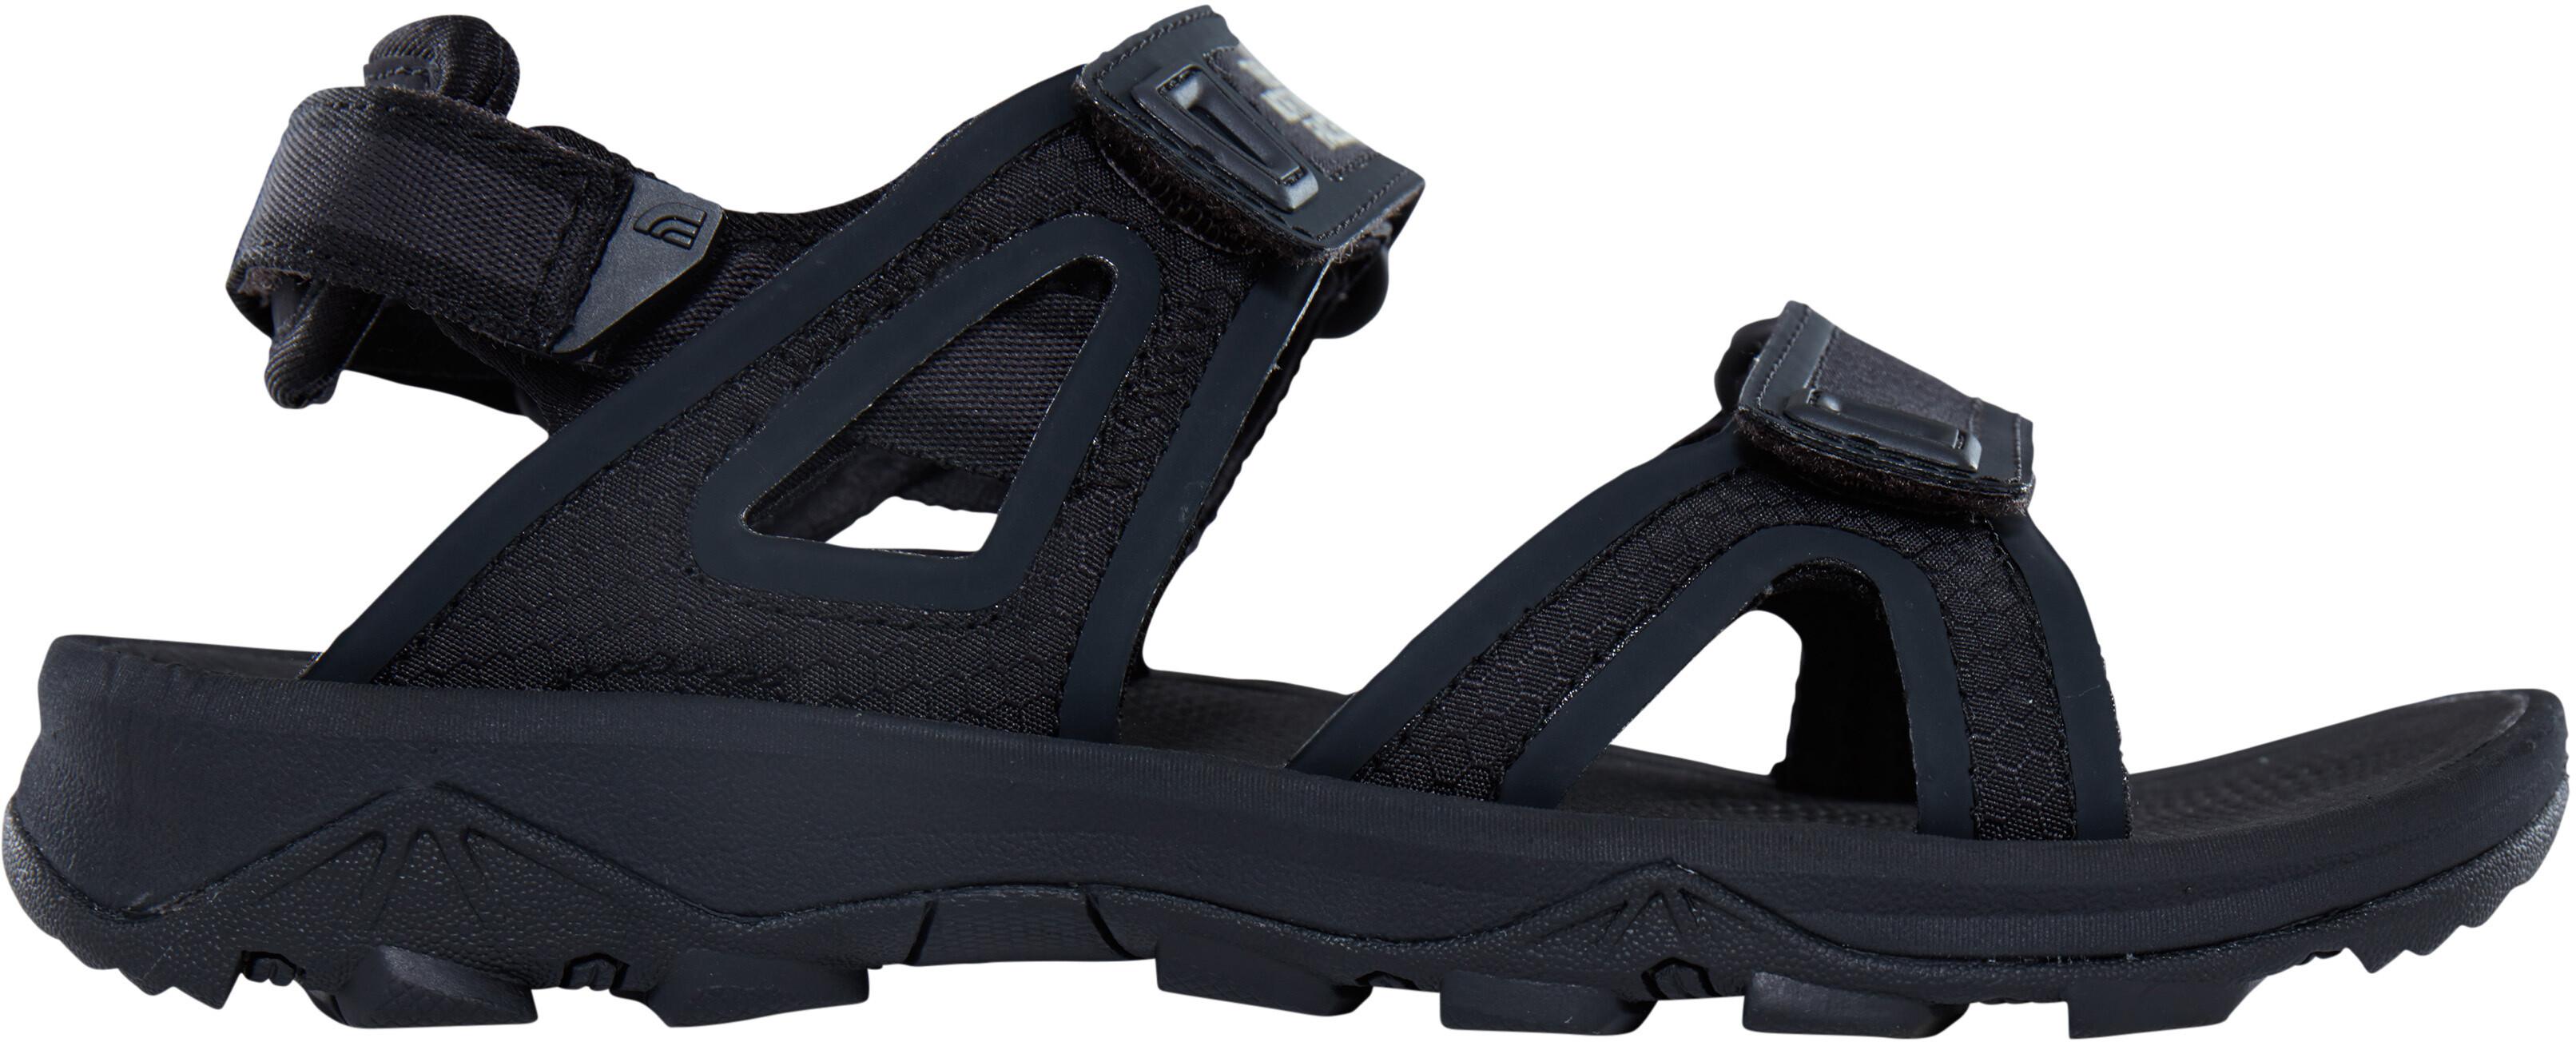 9416b9c2c The North Face Hedgehog II Sandals Women tnf black/vintage white